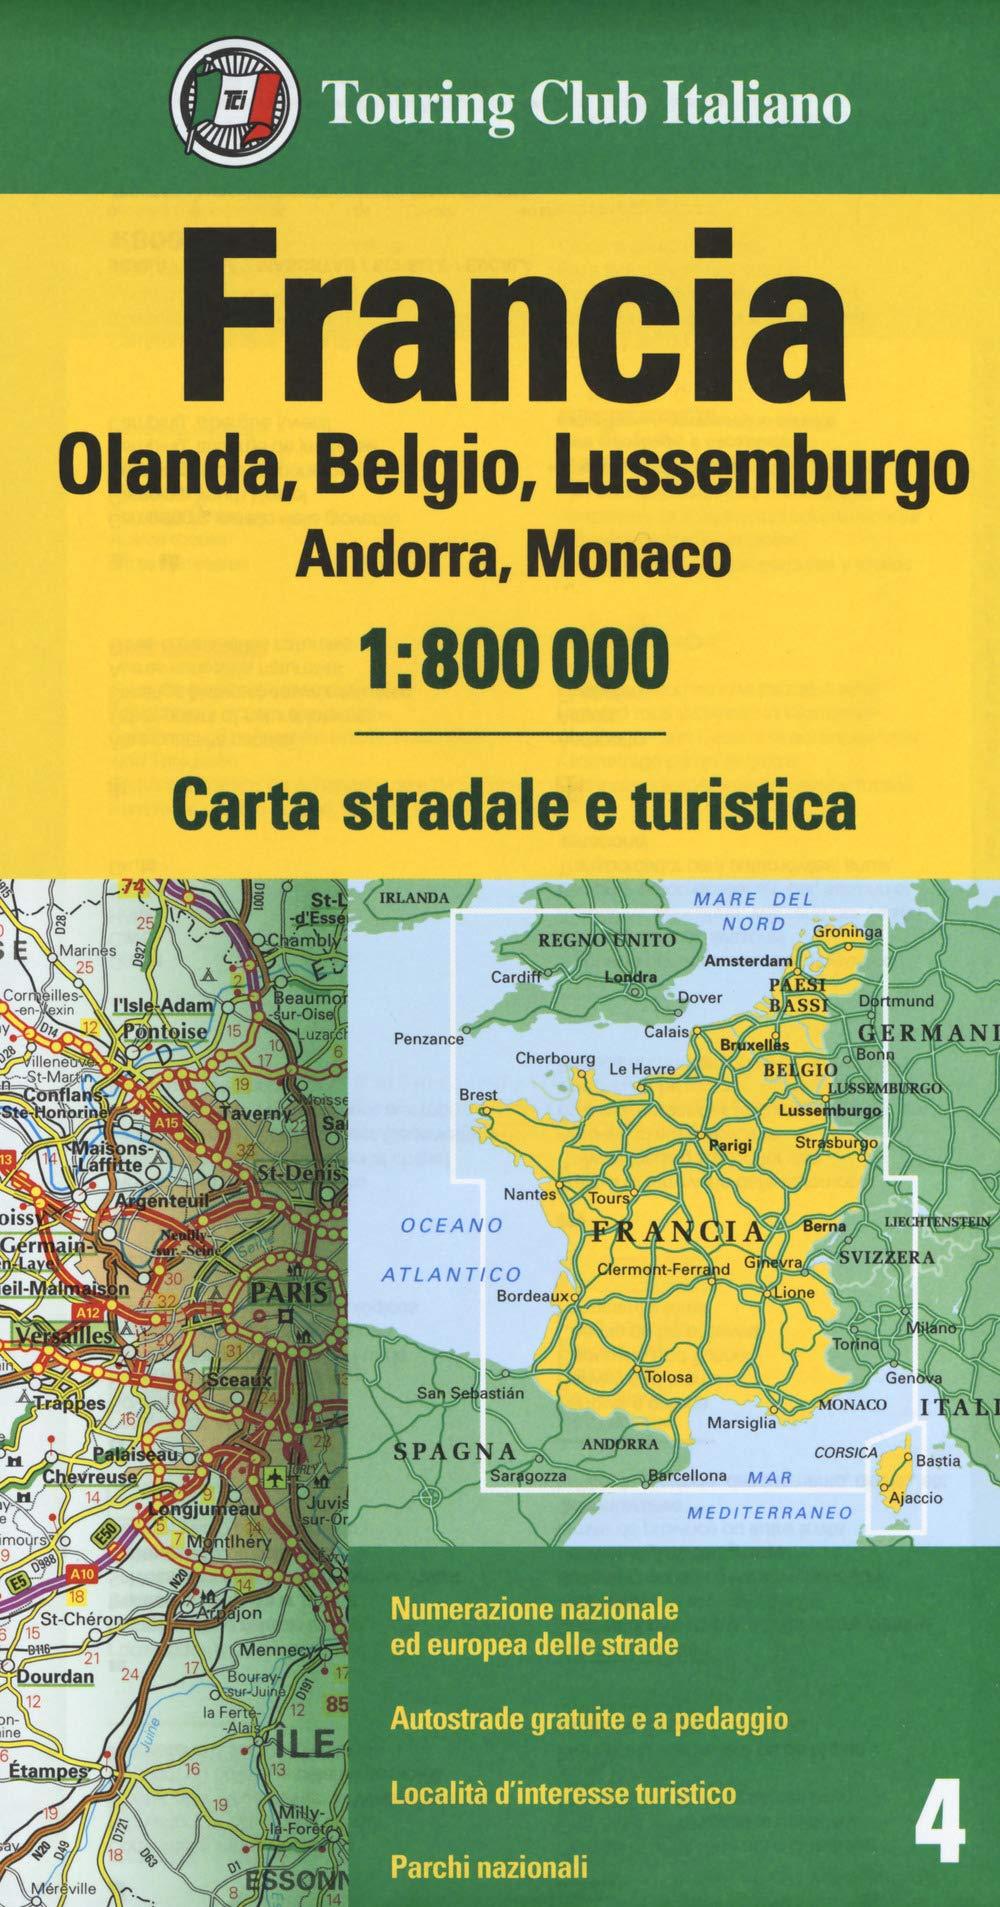 Olanda Cartina Stradale.Amazon It Francia Olanda Belgio Lussemburgo Andorra Monaco 1 800 000 Carta Stradale E Turistica Libri